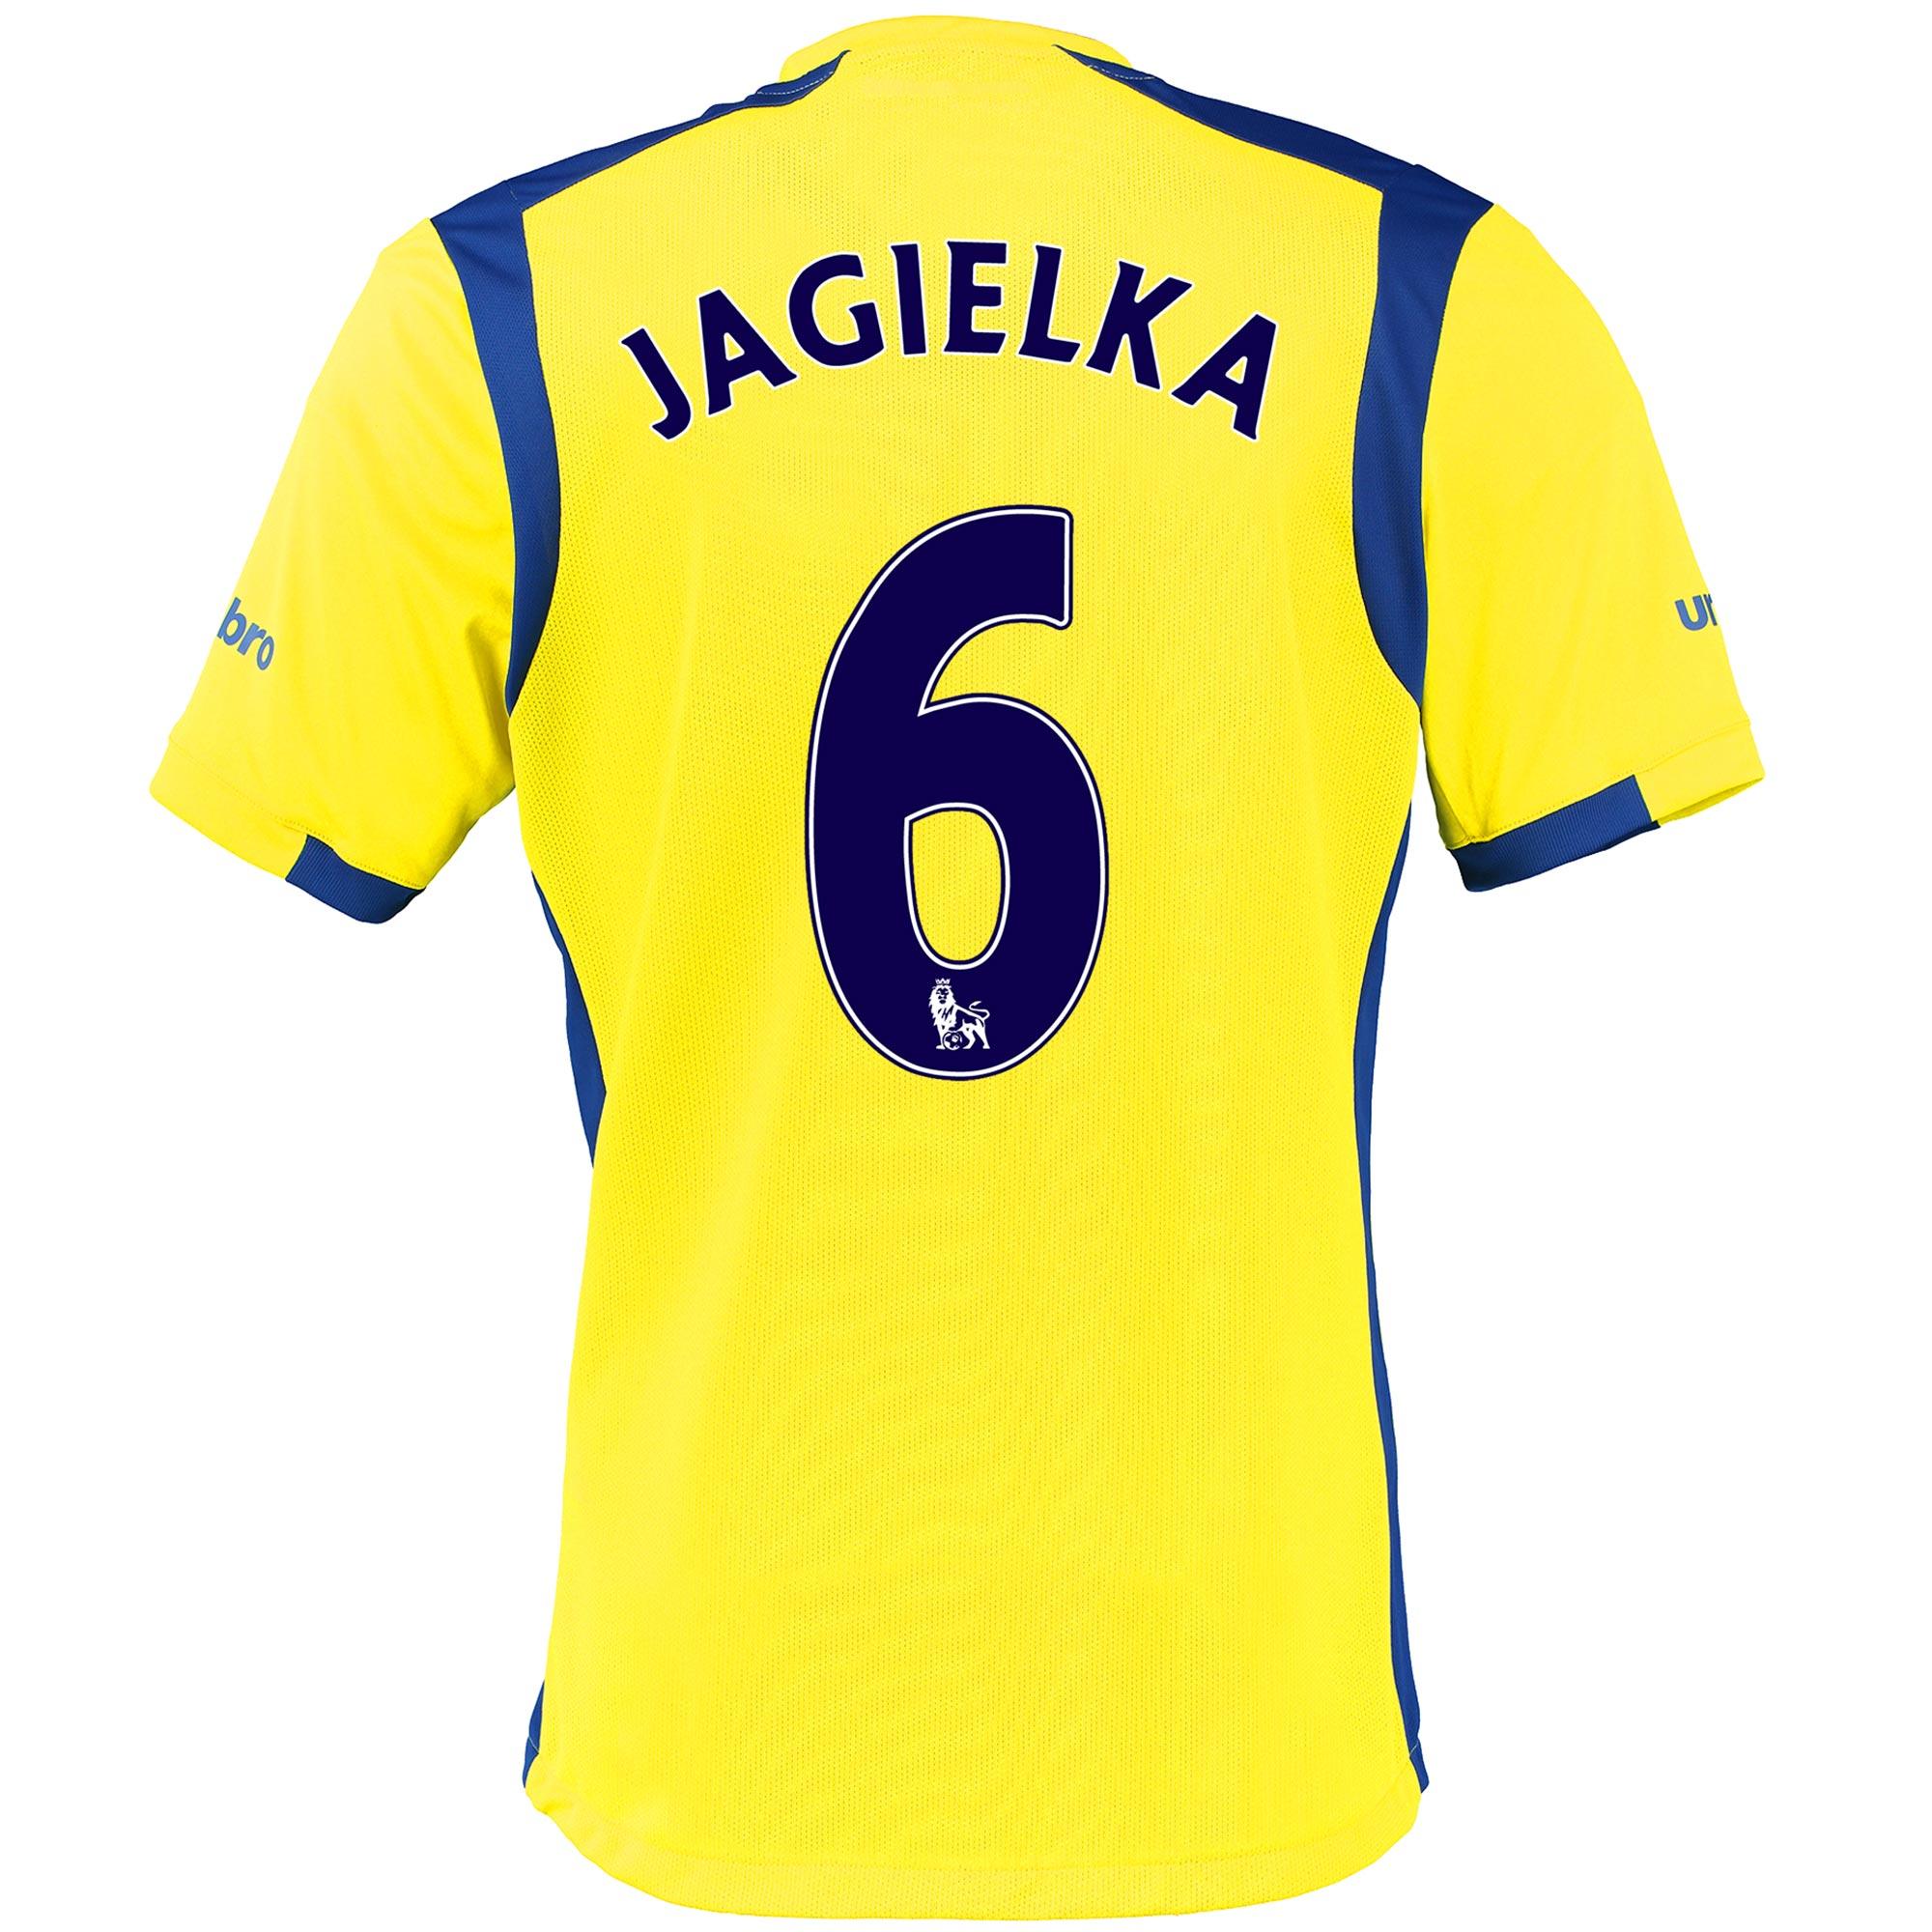 Everton 3rd Baby Kit 2016/17 with Jagielka 6 printing